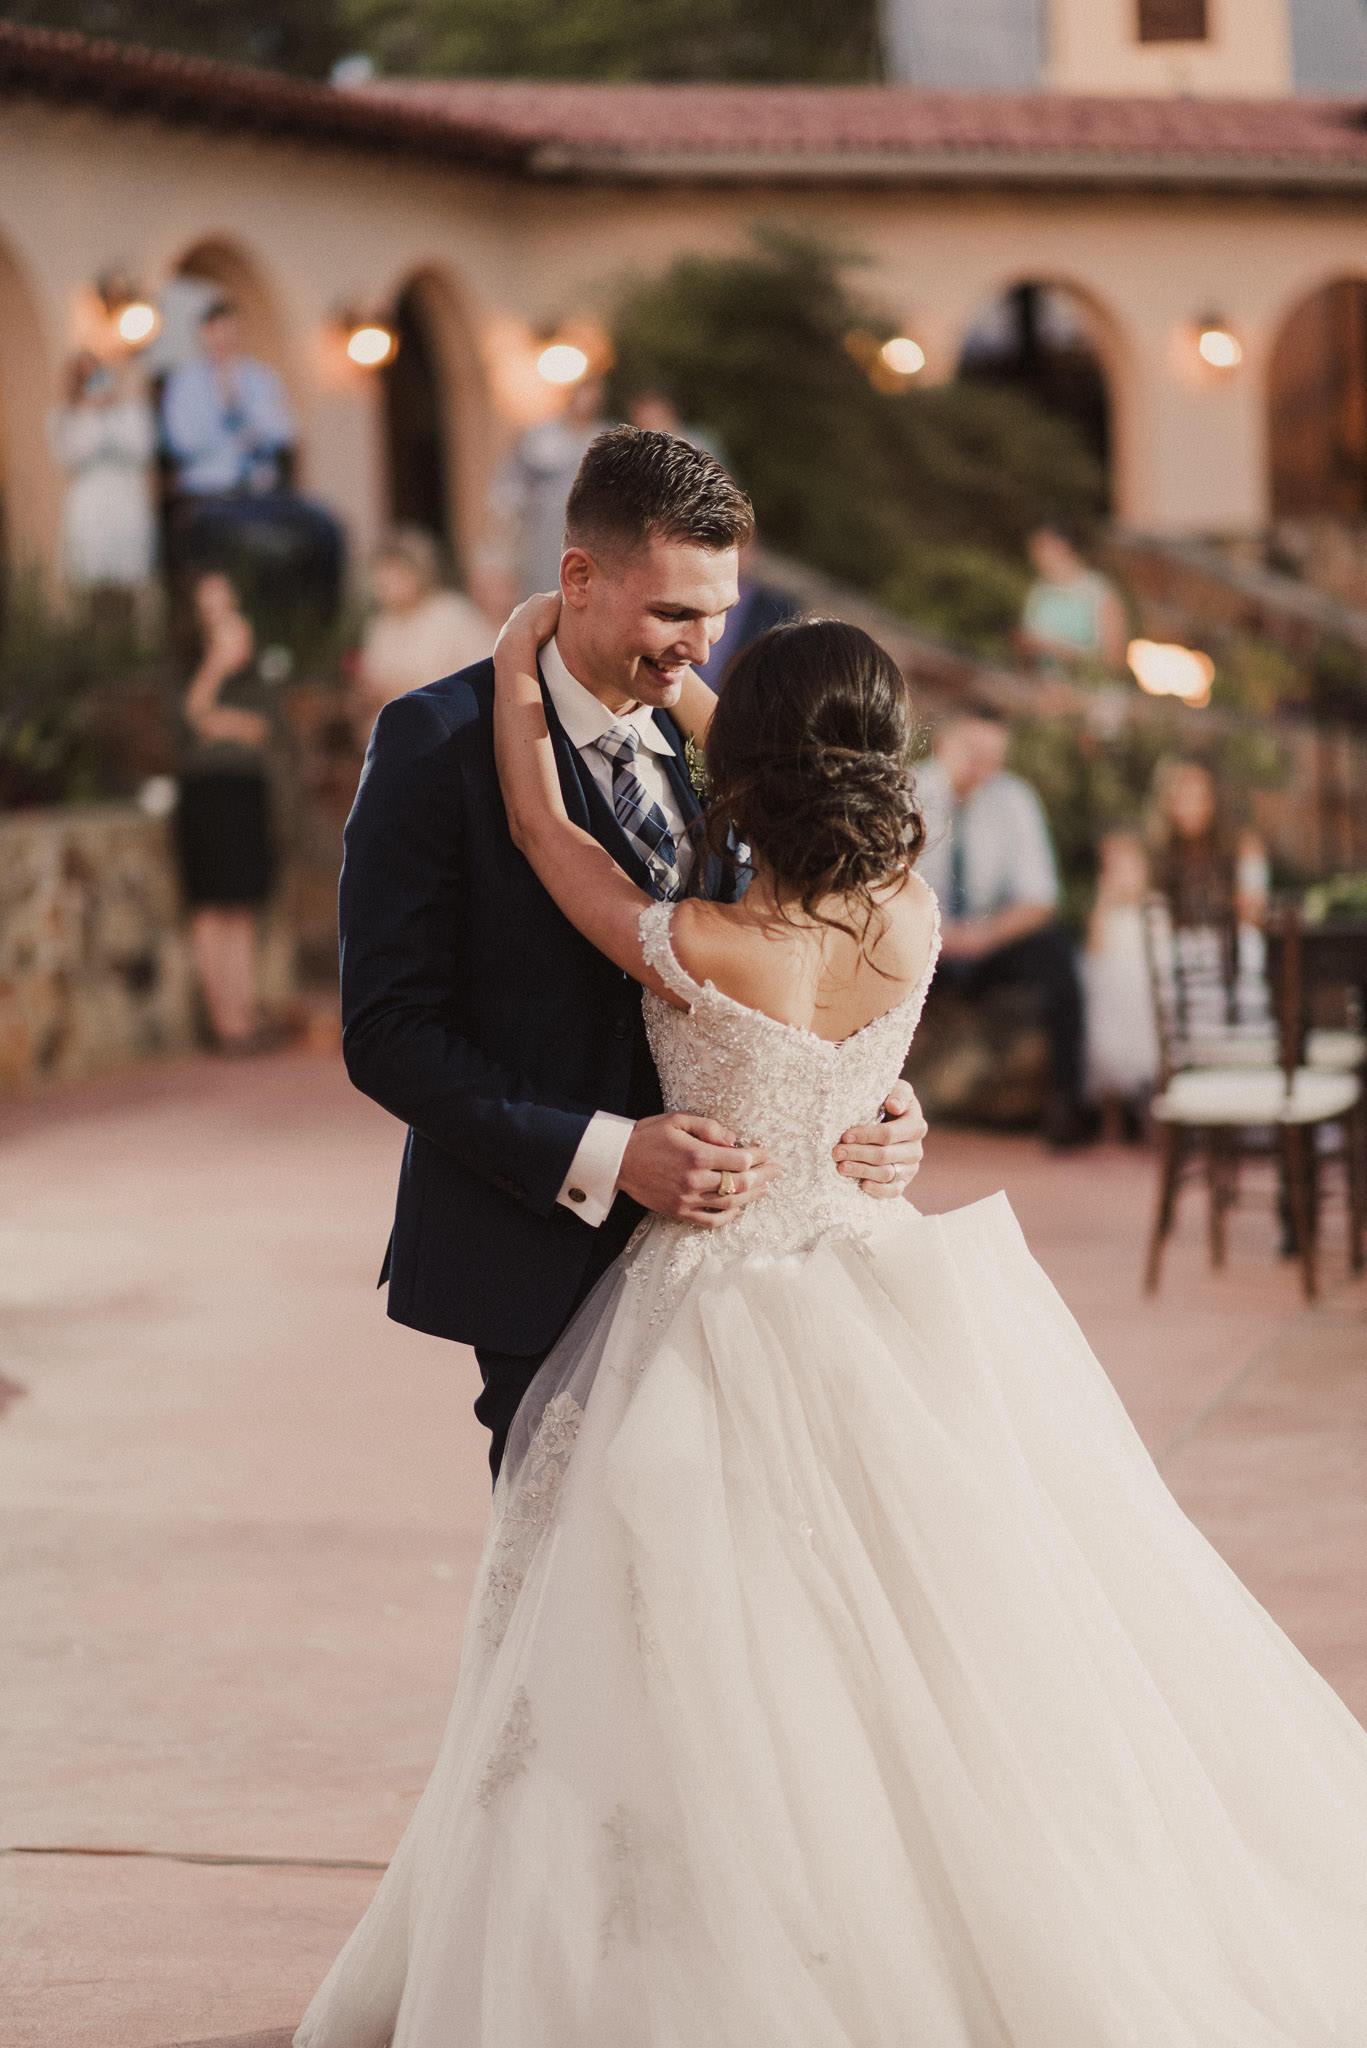 adriana-christian-wedding-re-sm-131.jpg